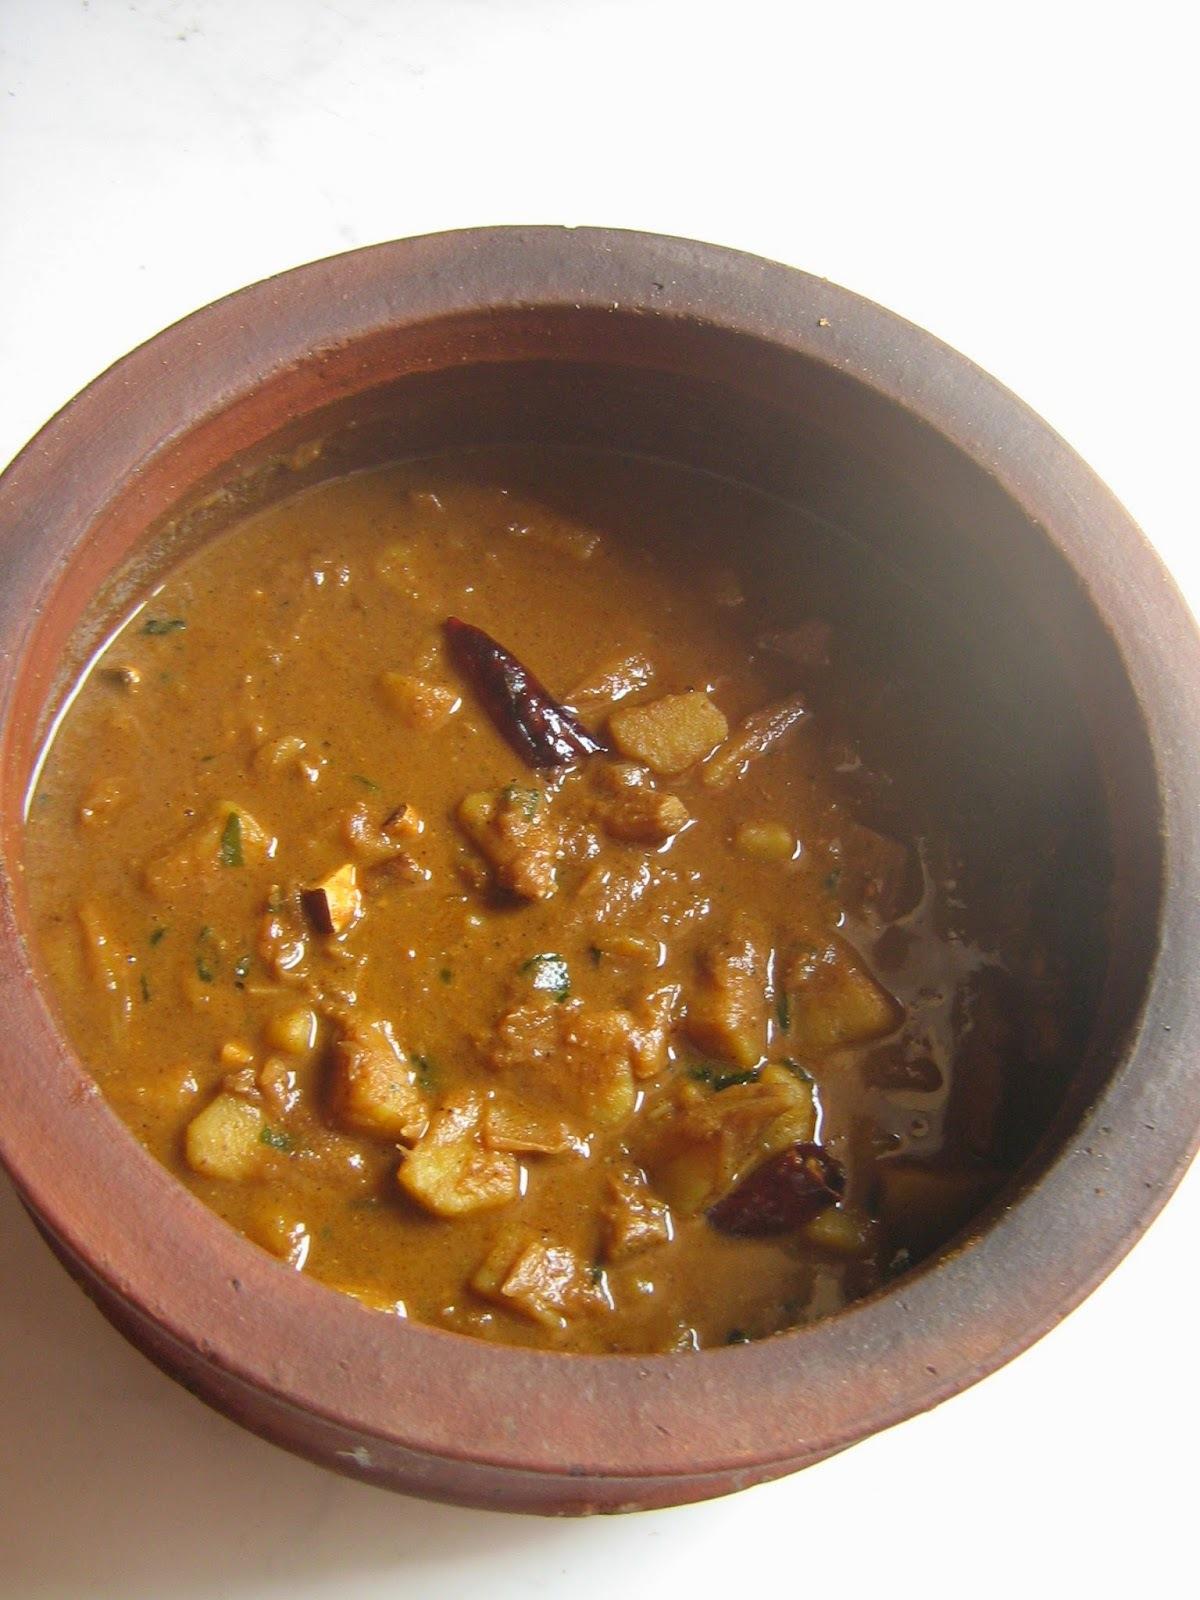 Kadachakka curry / seemachakka curry / breadfruit curry